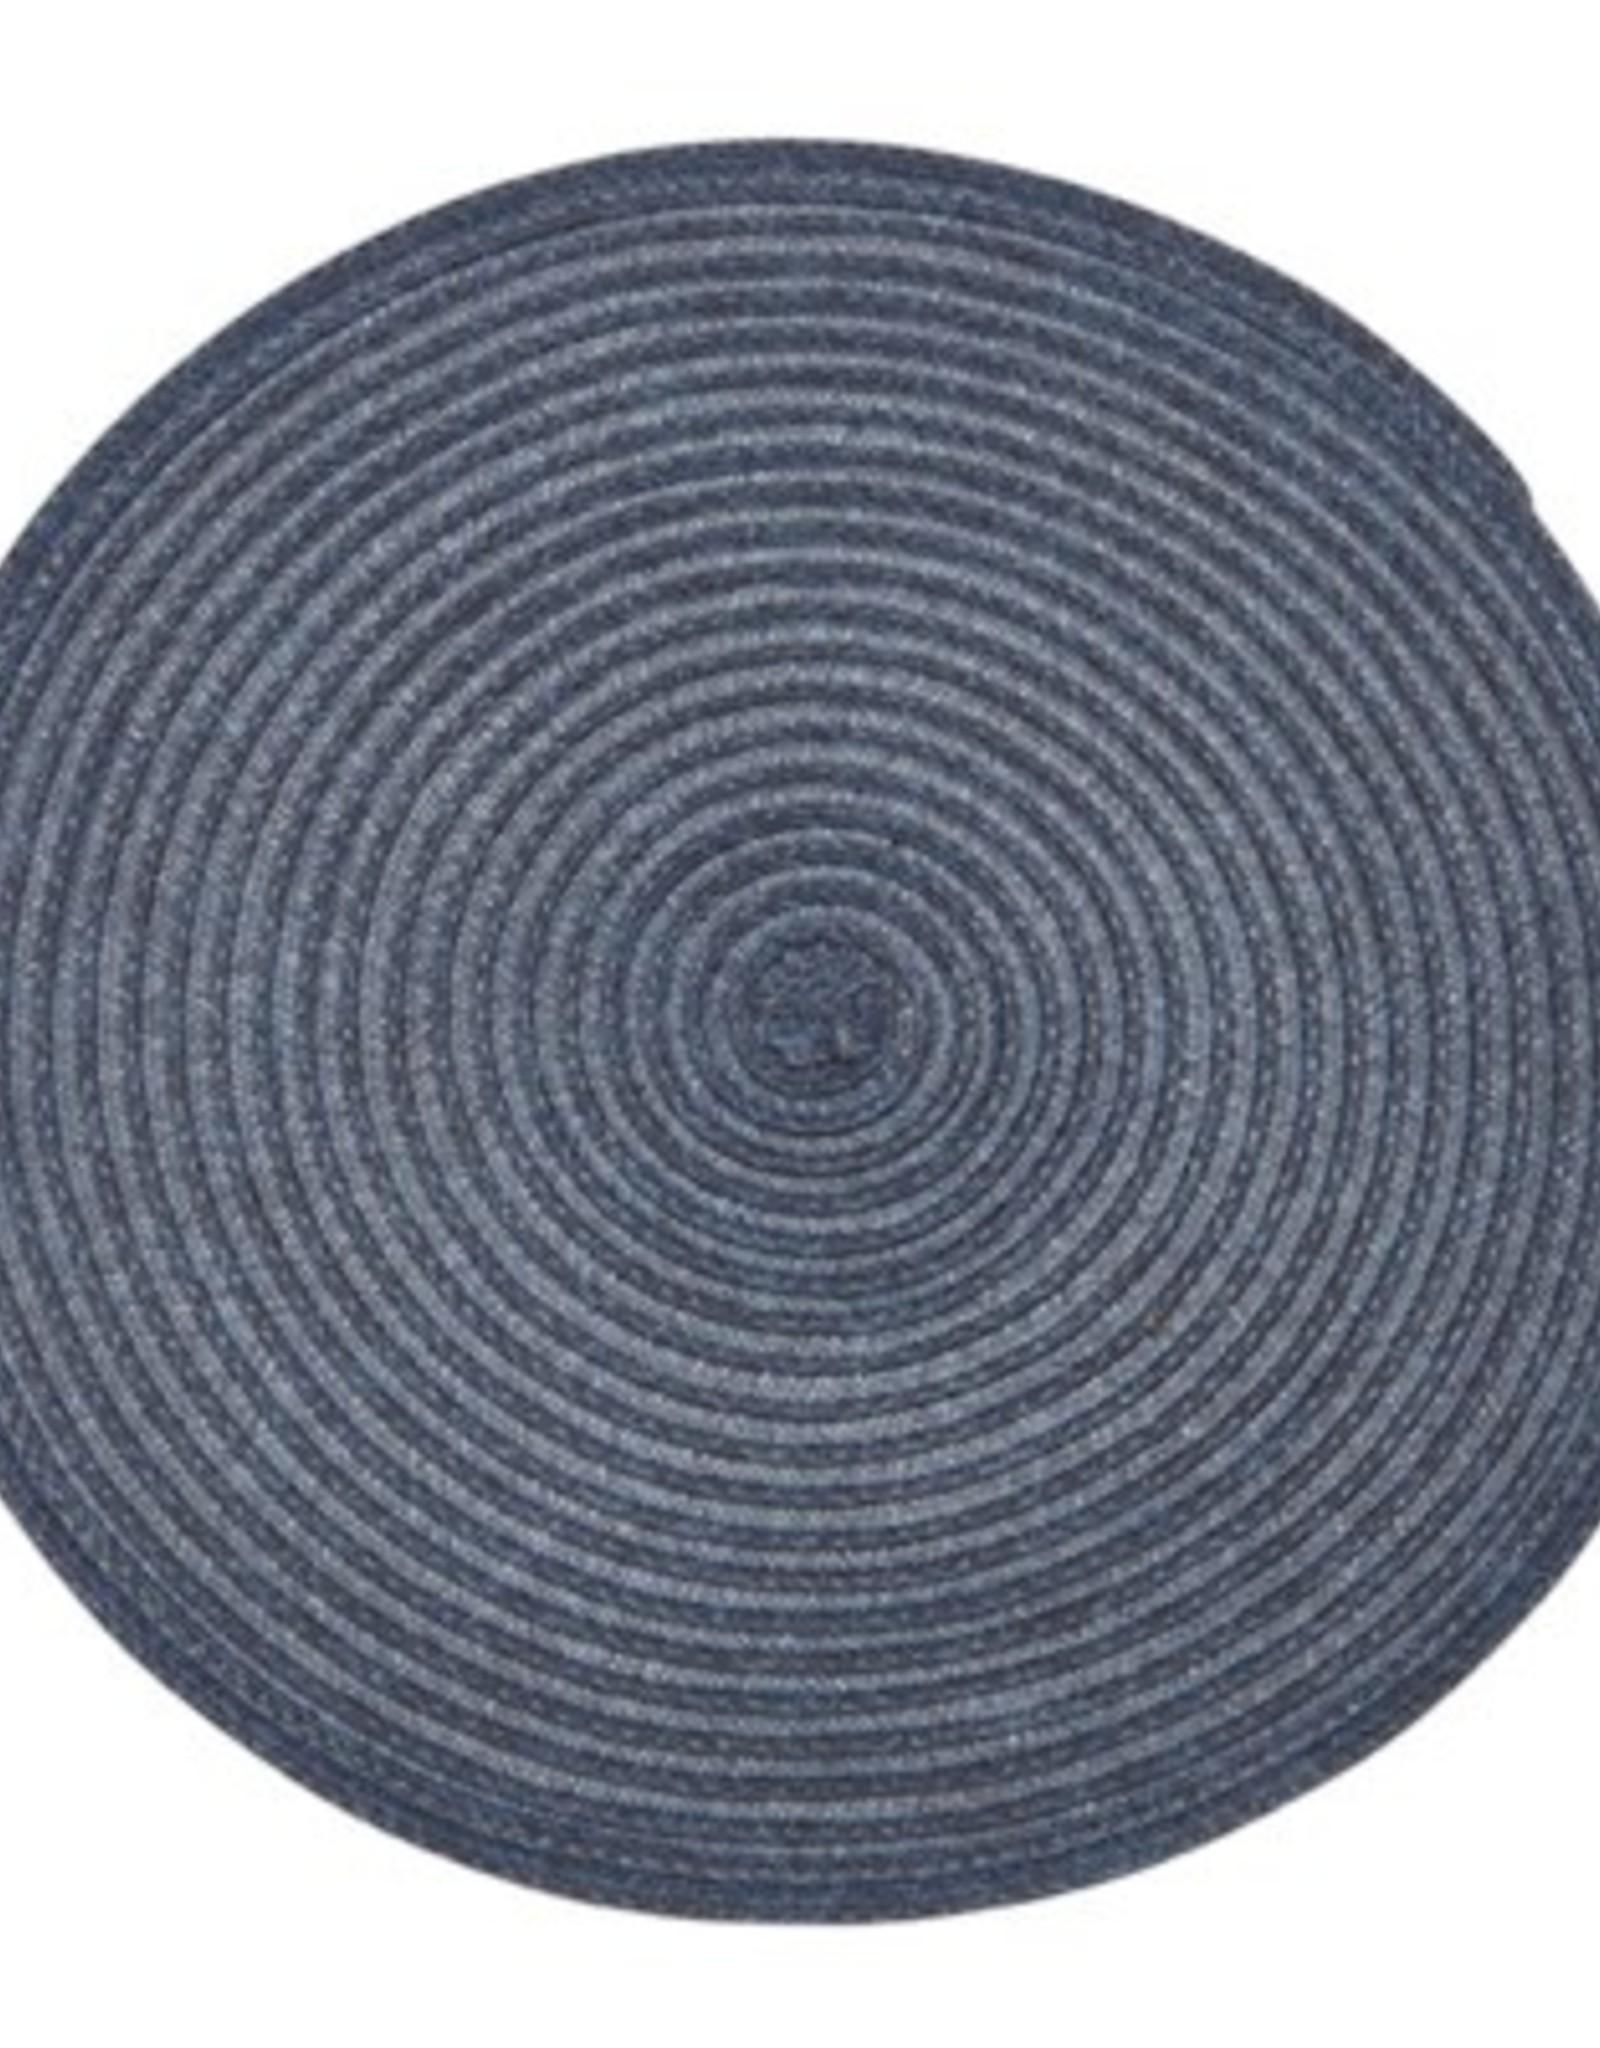 Placemat Harman Urban Two Tone Round Blue